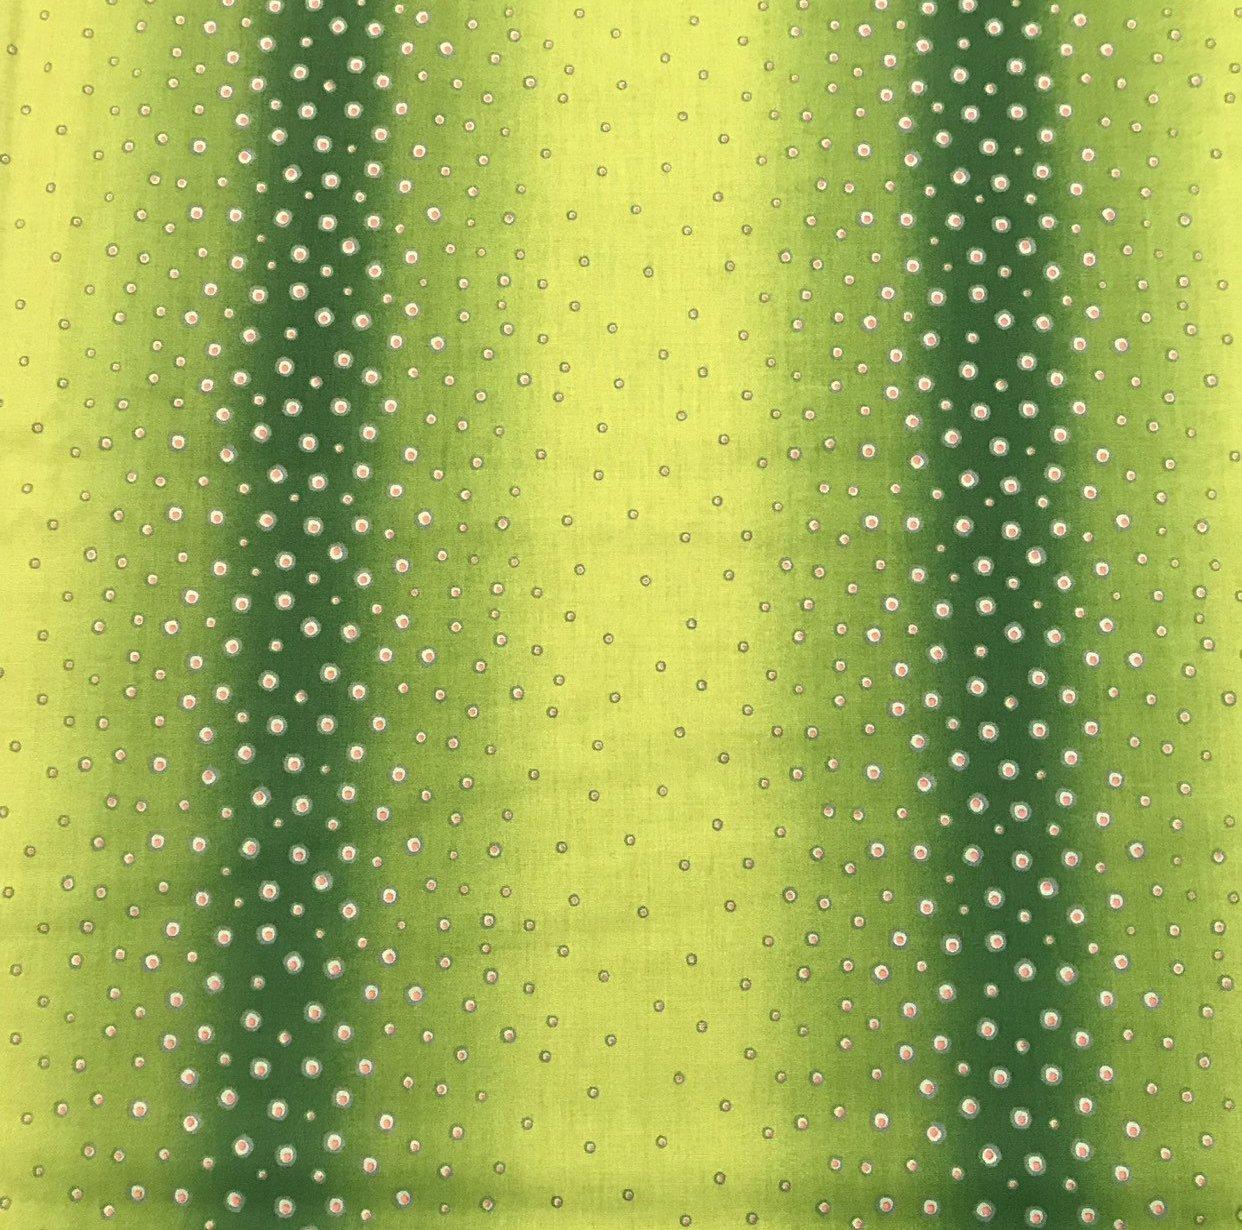 Photochrome Petals Green